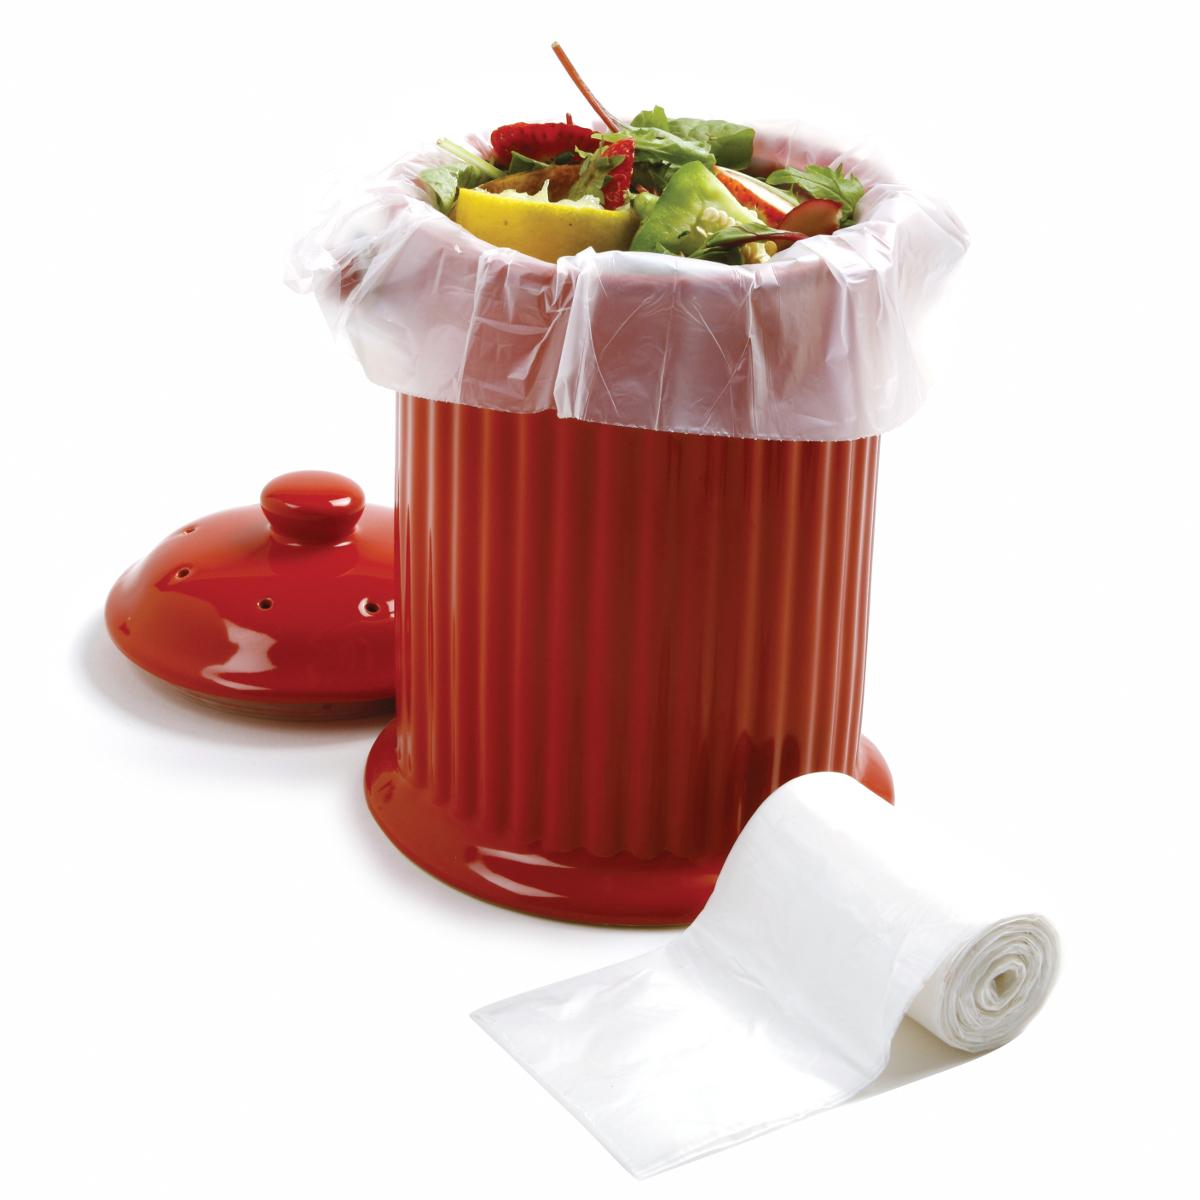 Norpro Bio-Degradable Compost Bag, Set of 50